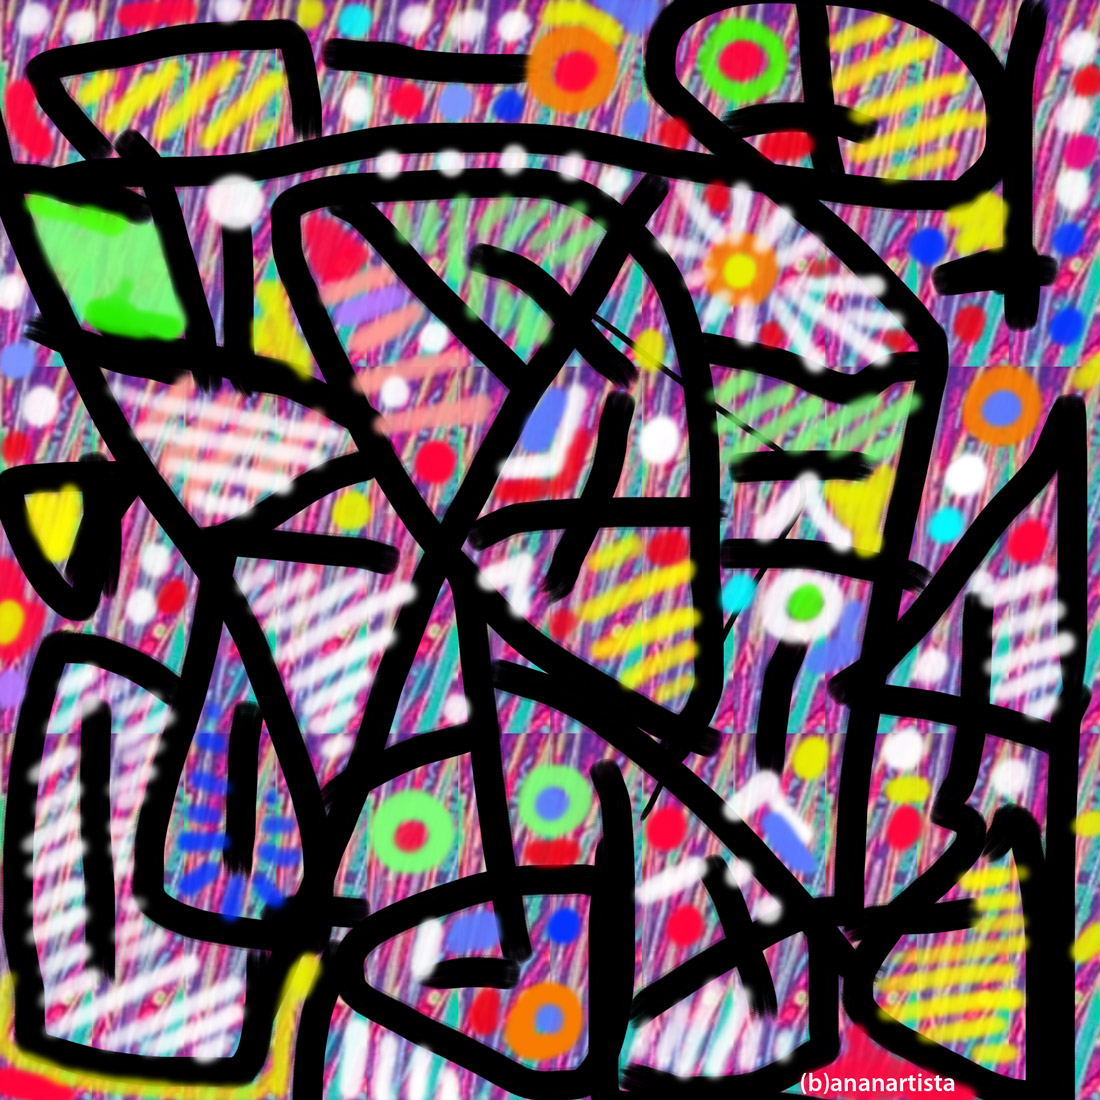 endoplasmic reticulum: digital painting by (b)ananartista sbuff